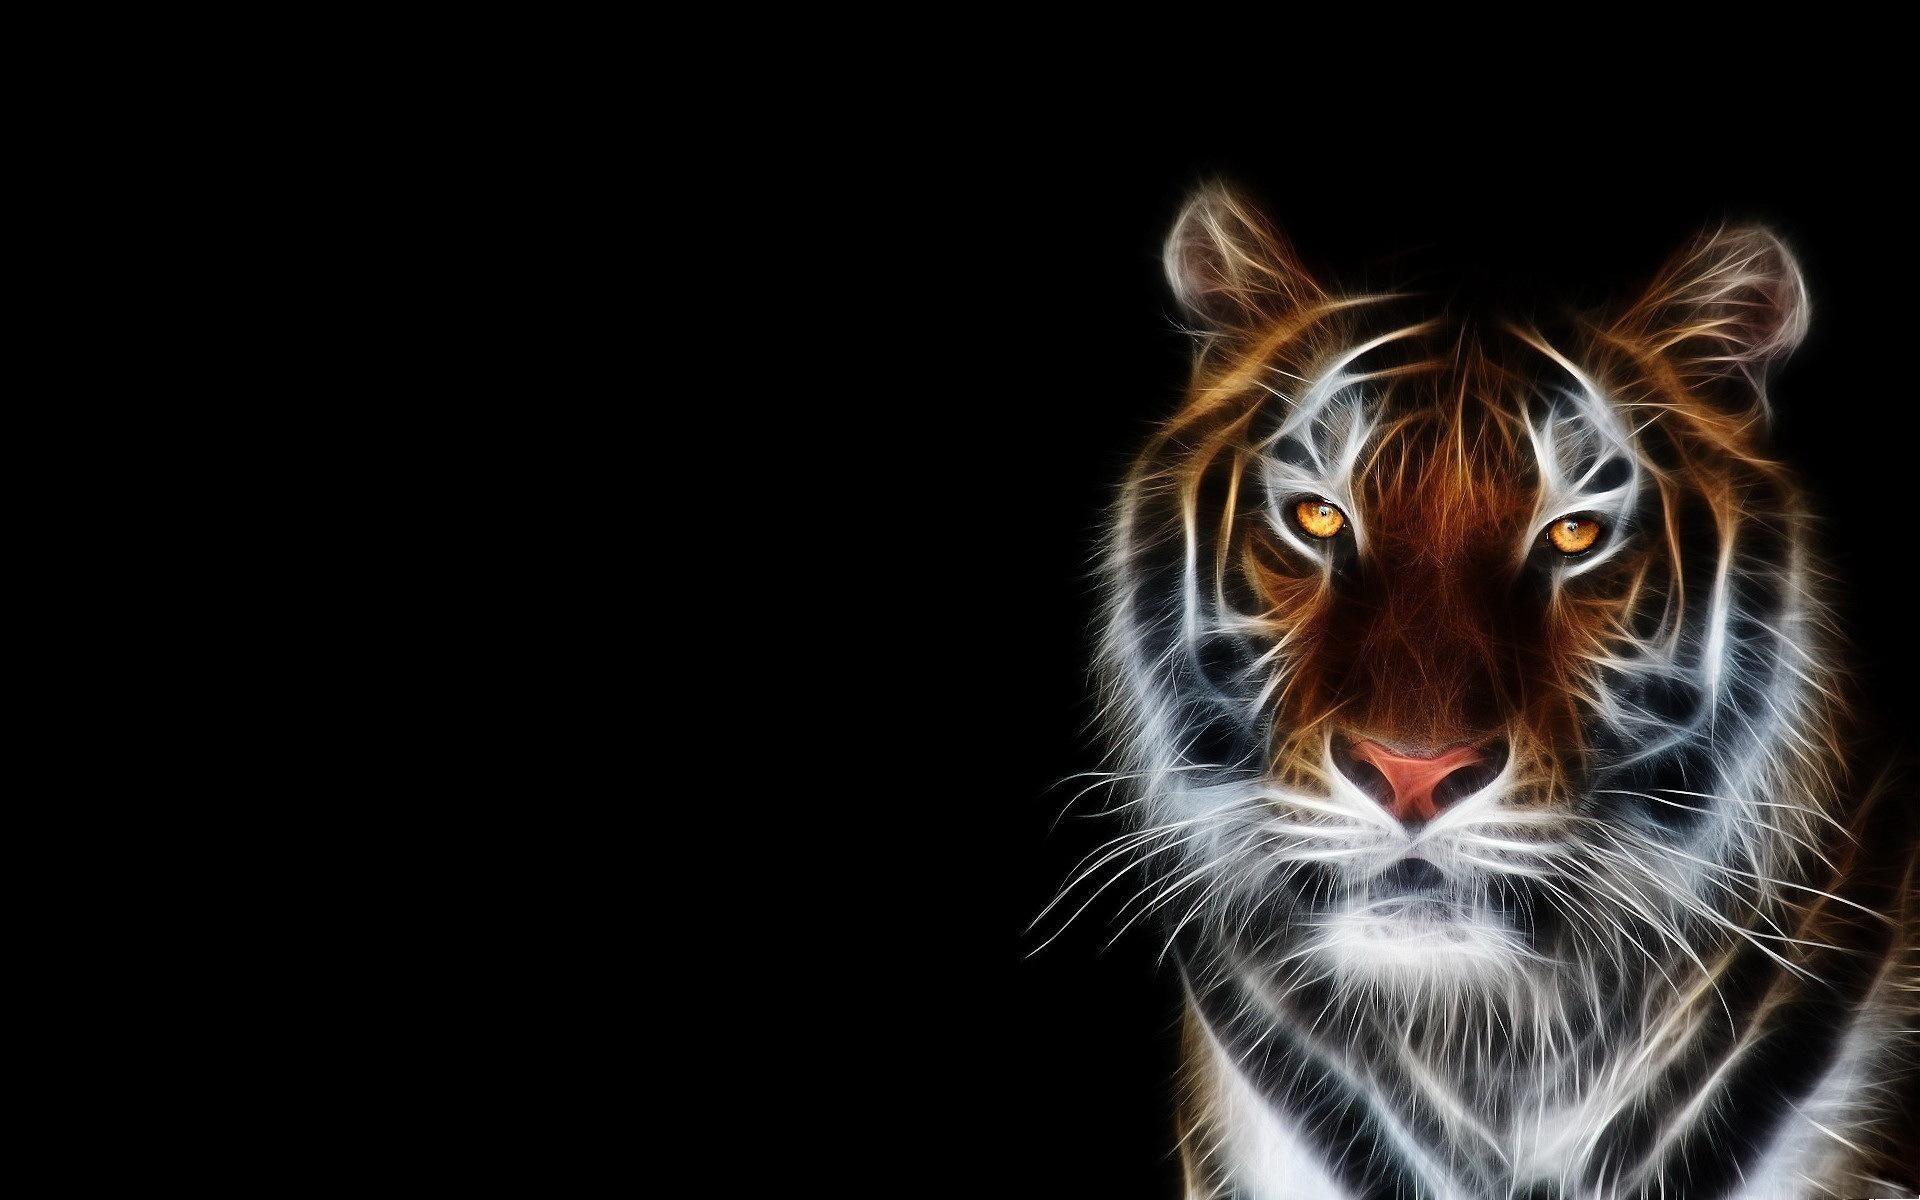 Tiger Art, Free Wallpaper